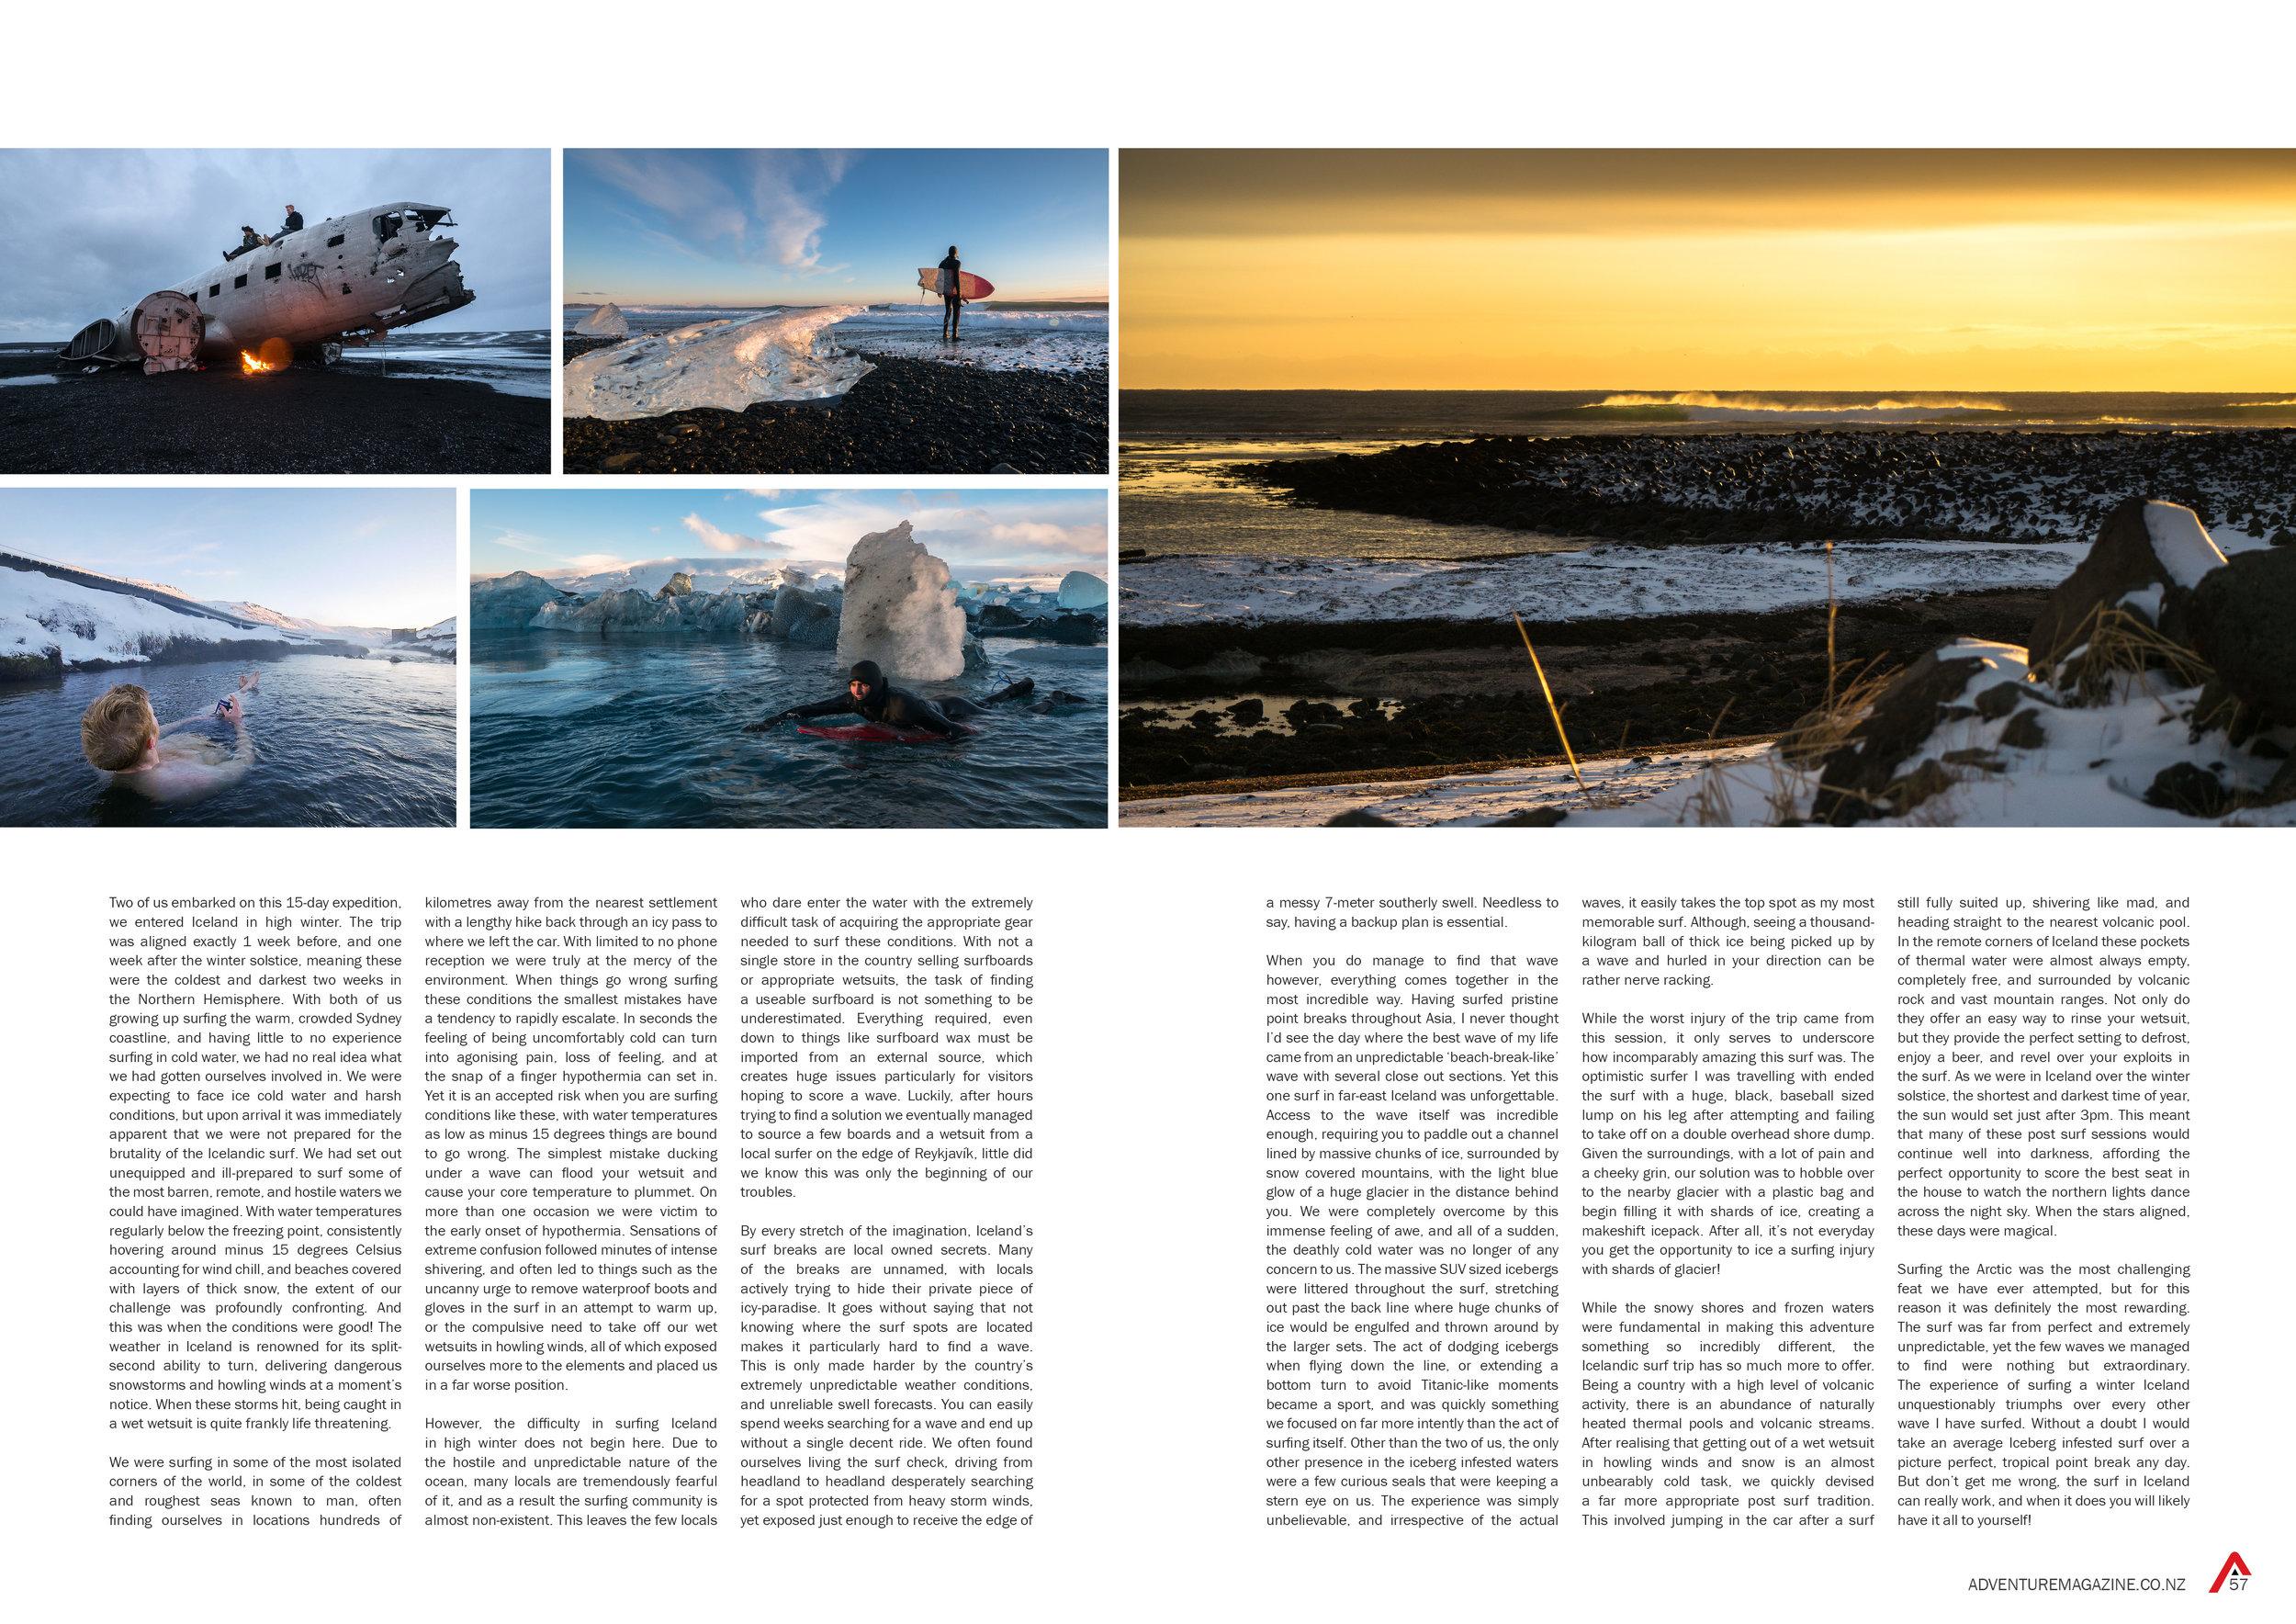 Surfing Iceland_Publication 2.jpg